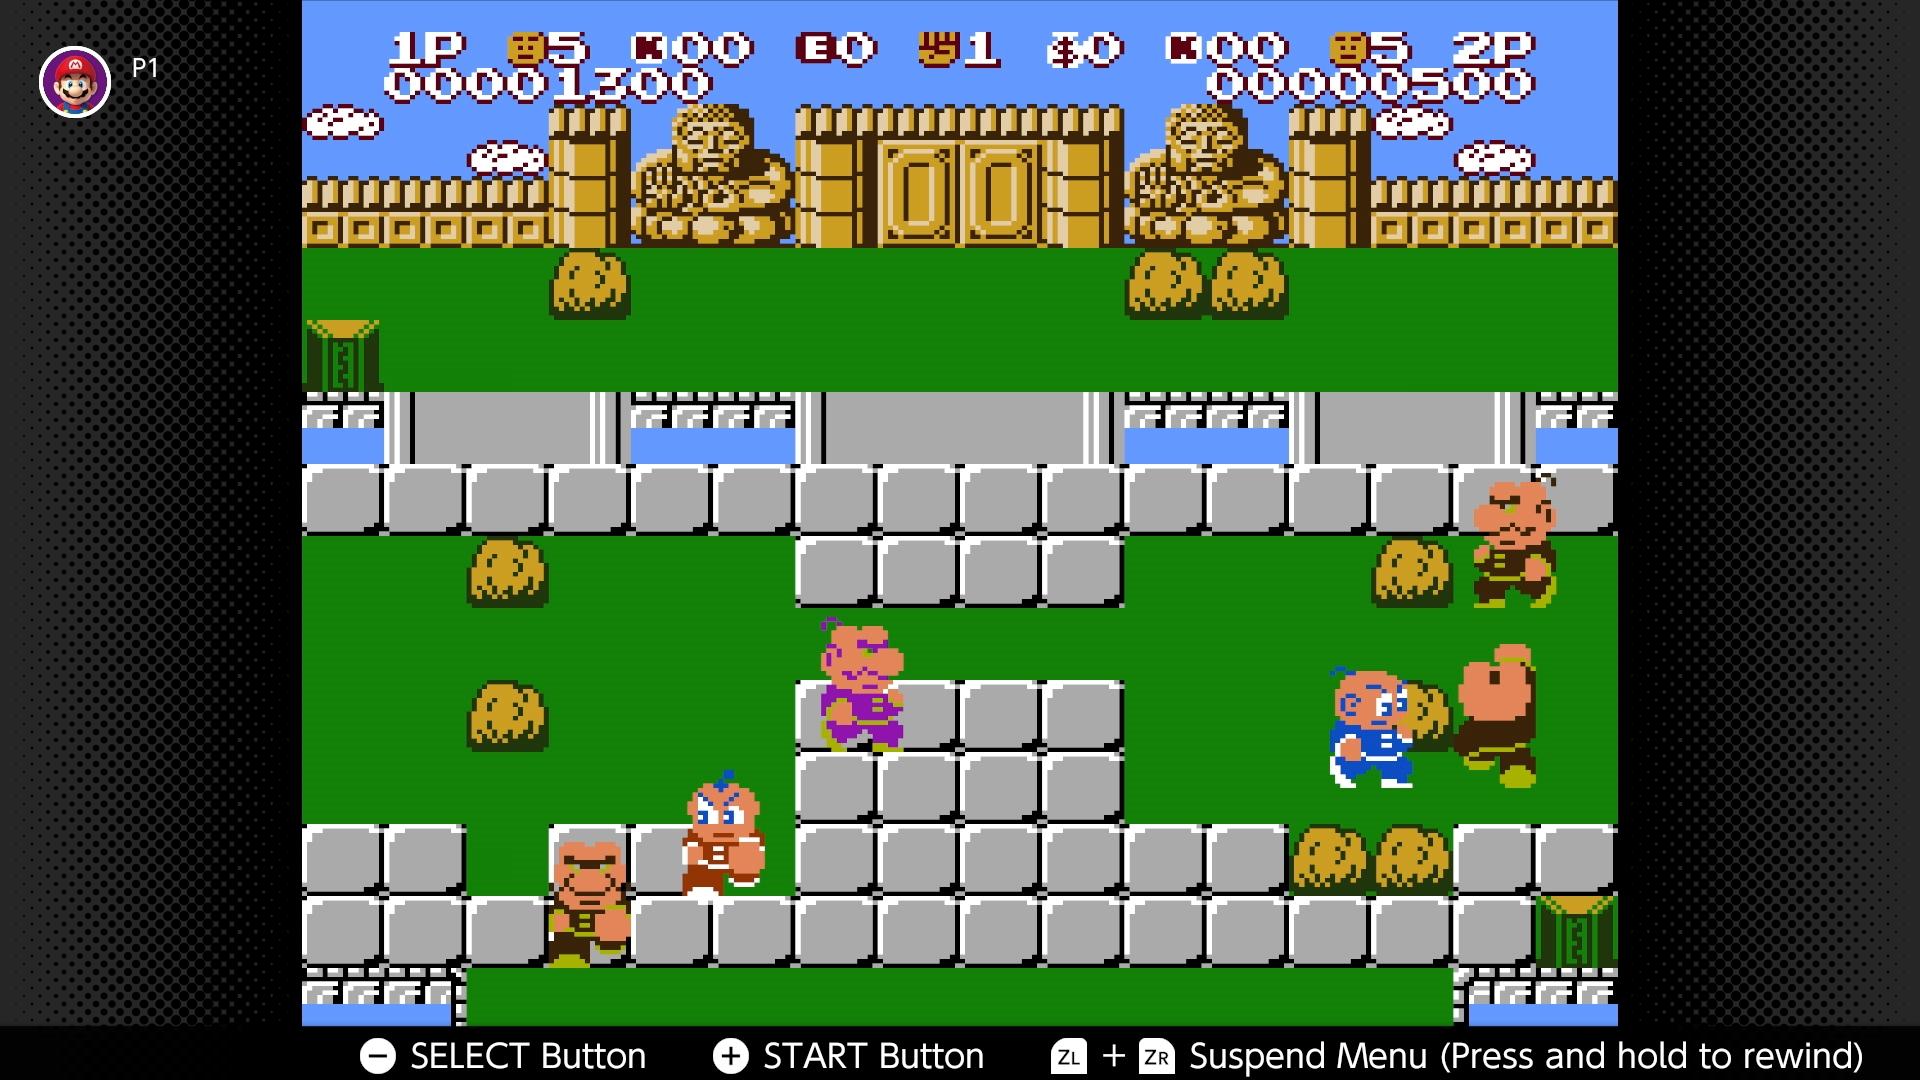 Nintendo News: Choose Your Adventure! Two NES™ Games Join Nintendo